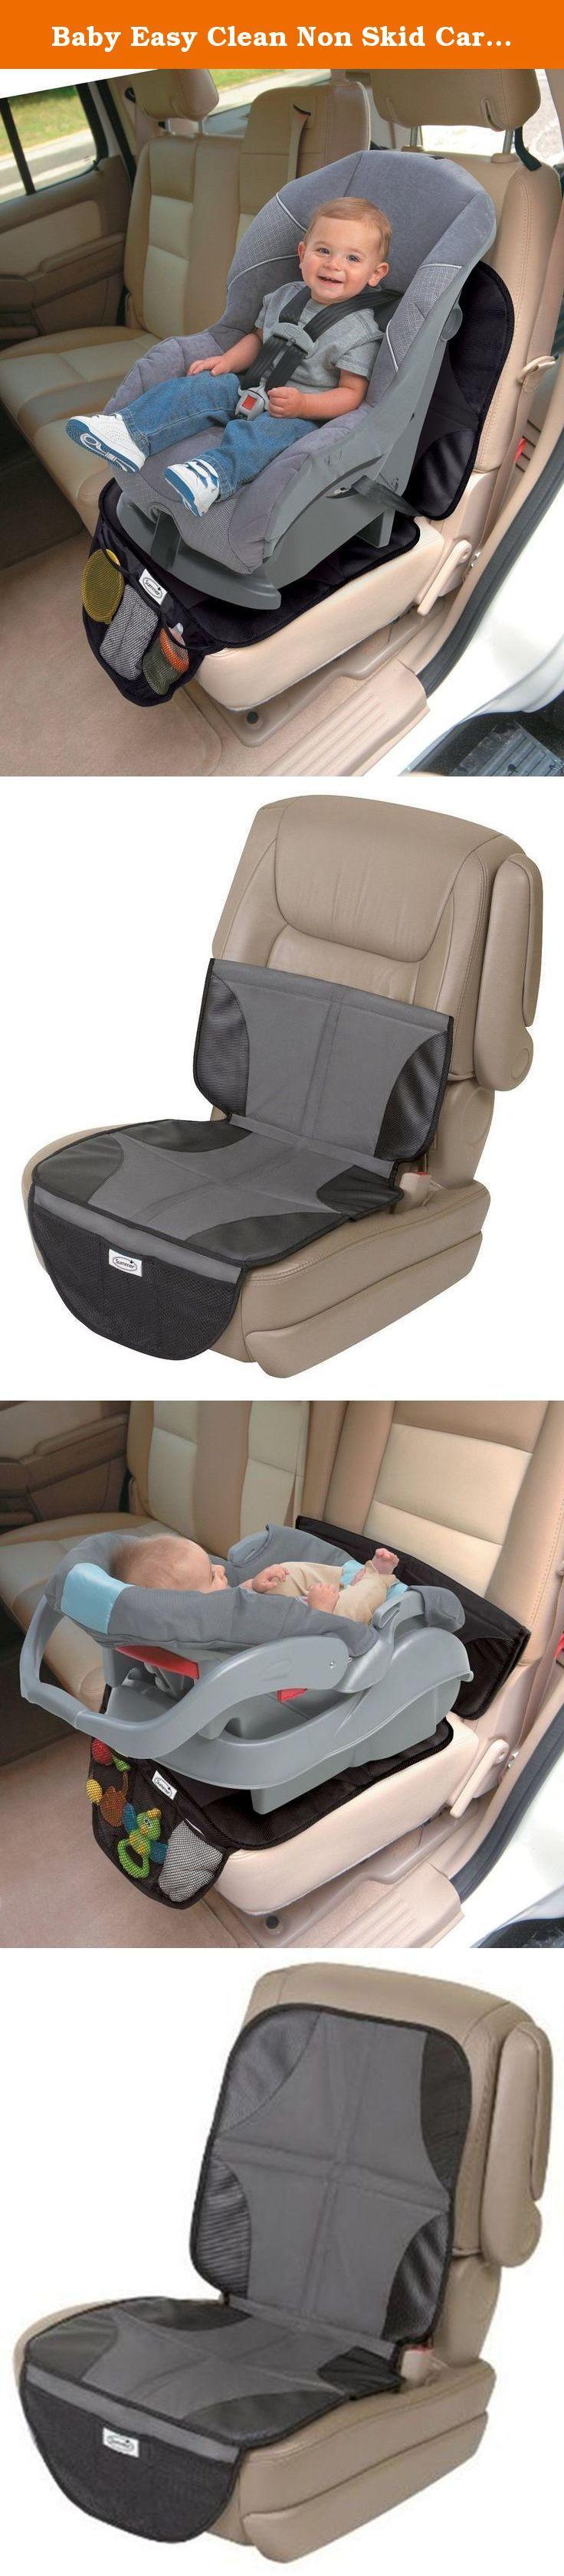 best 25 car seat mat ideas on pinterest seat protector travel car seat and minivan organization. Black Bedroom Furniture Sets. Home Design Ideas